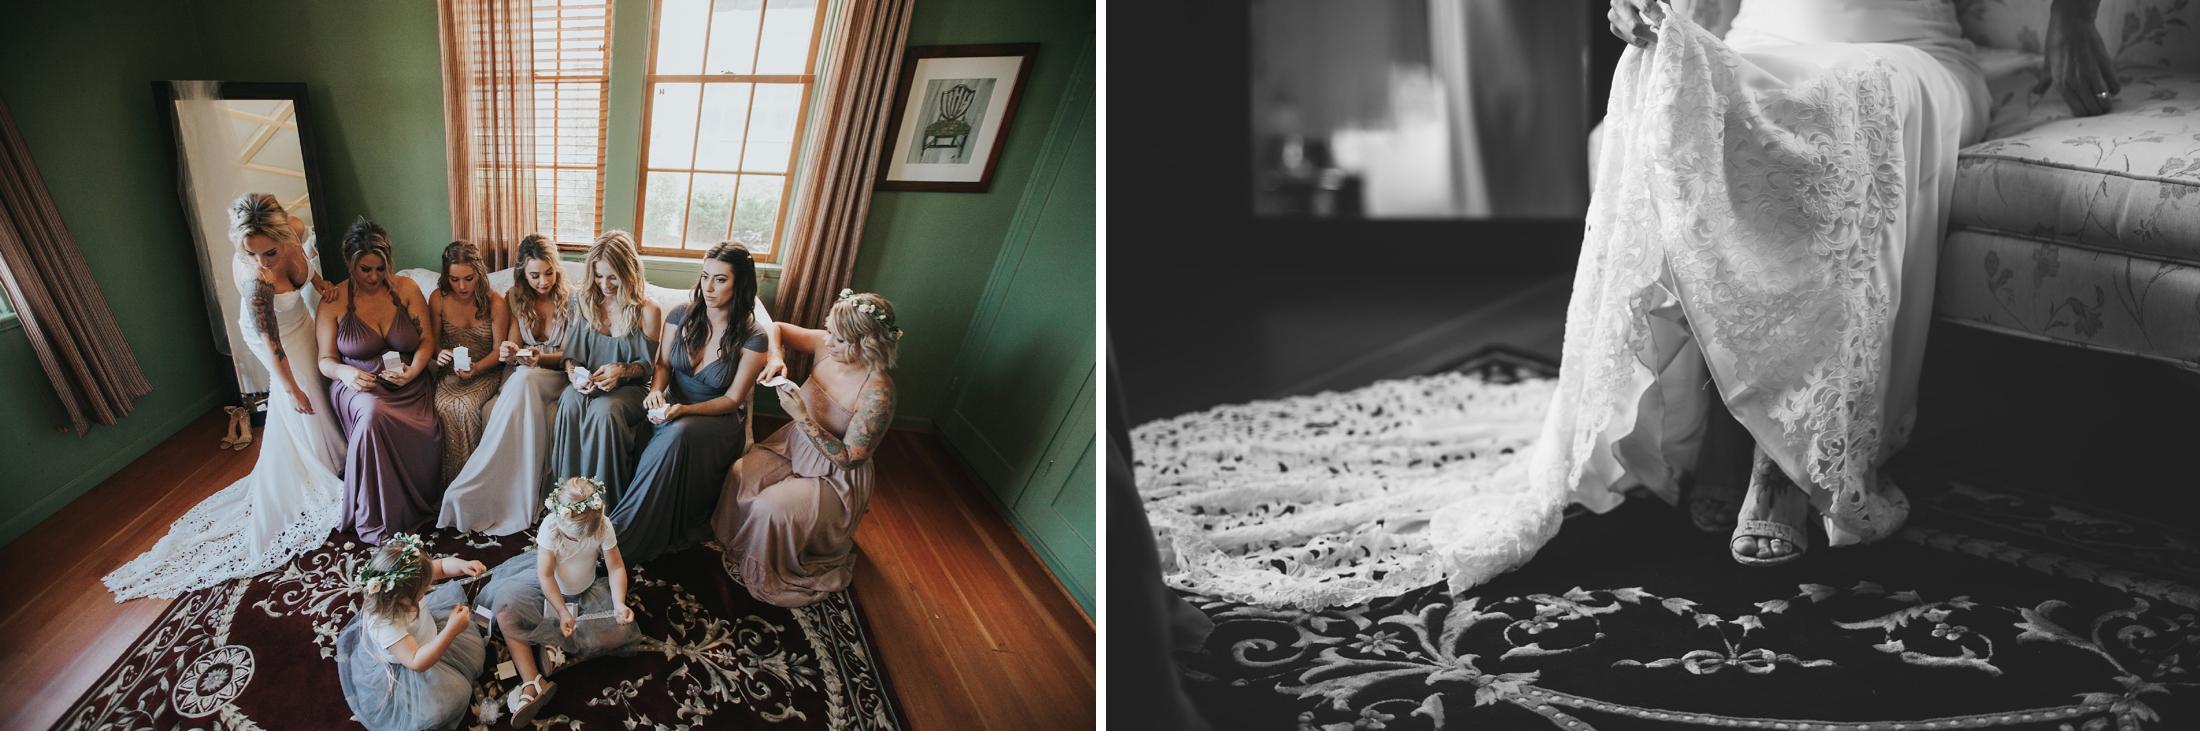 old-sugar-mill-wedding-photographer-sacramento-08.jpg